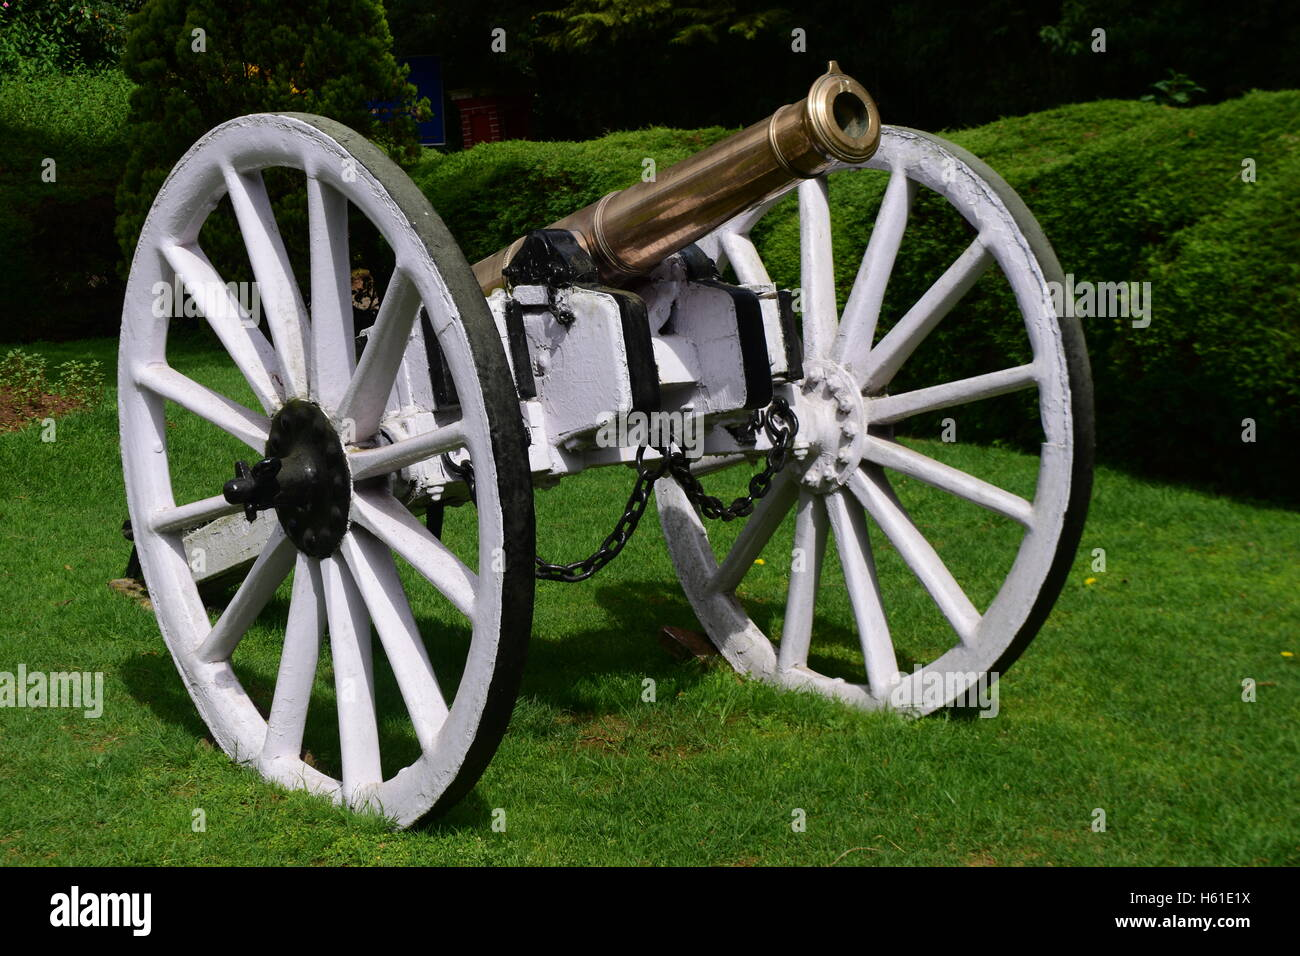 Beautiful Old British Cannon at Ooty Botanical Garden India - Stock Image